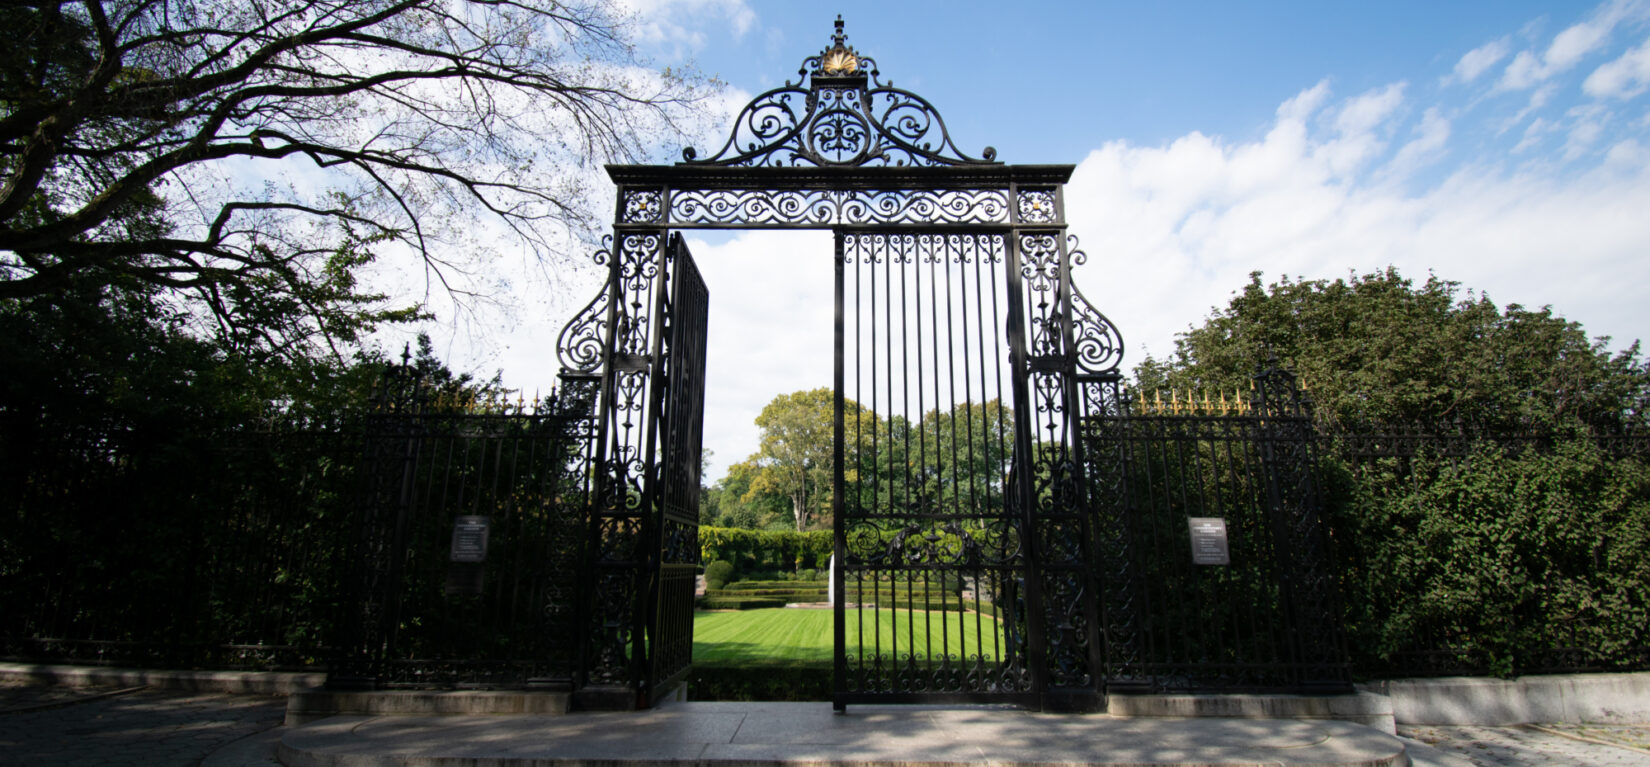 Vanderbilt Gates 20181023 0002